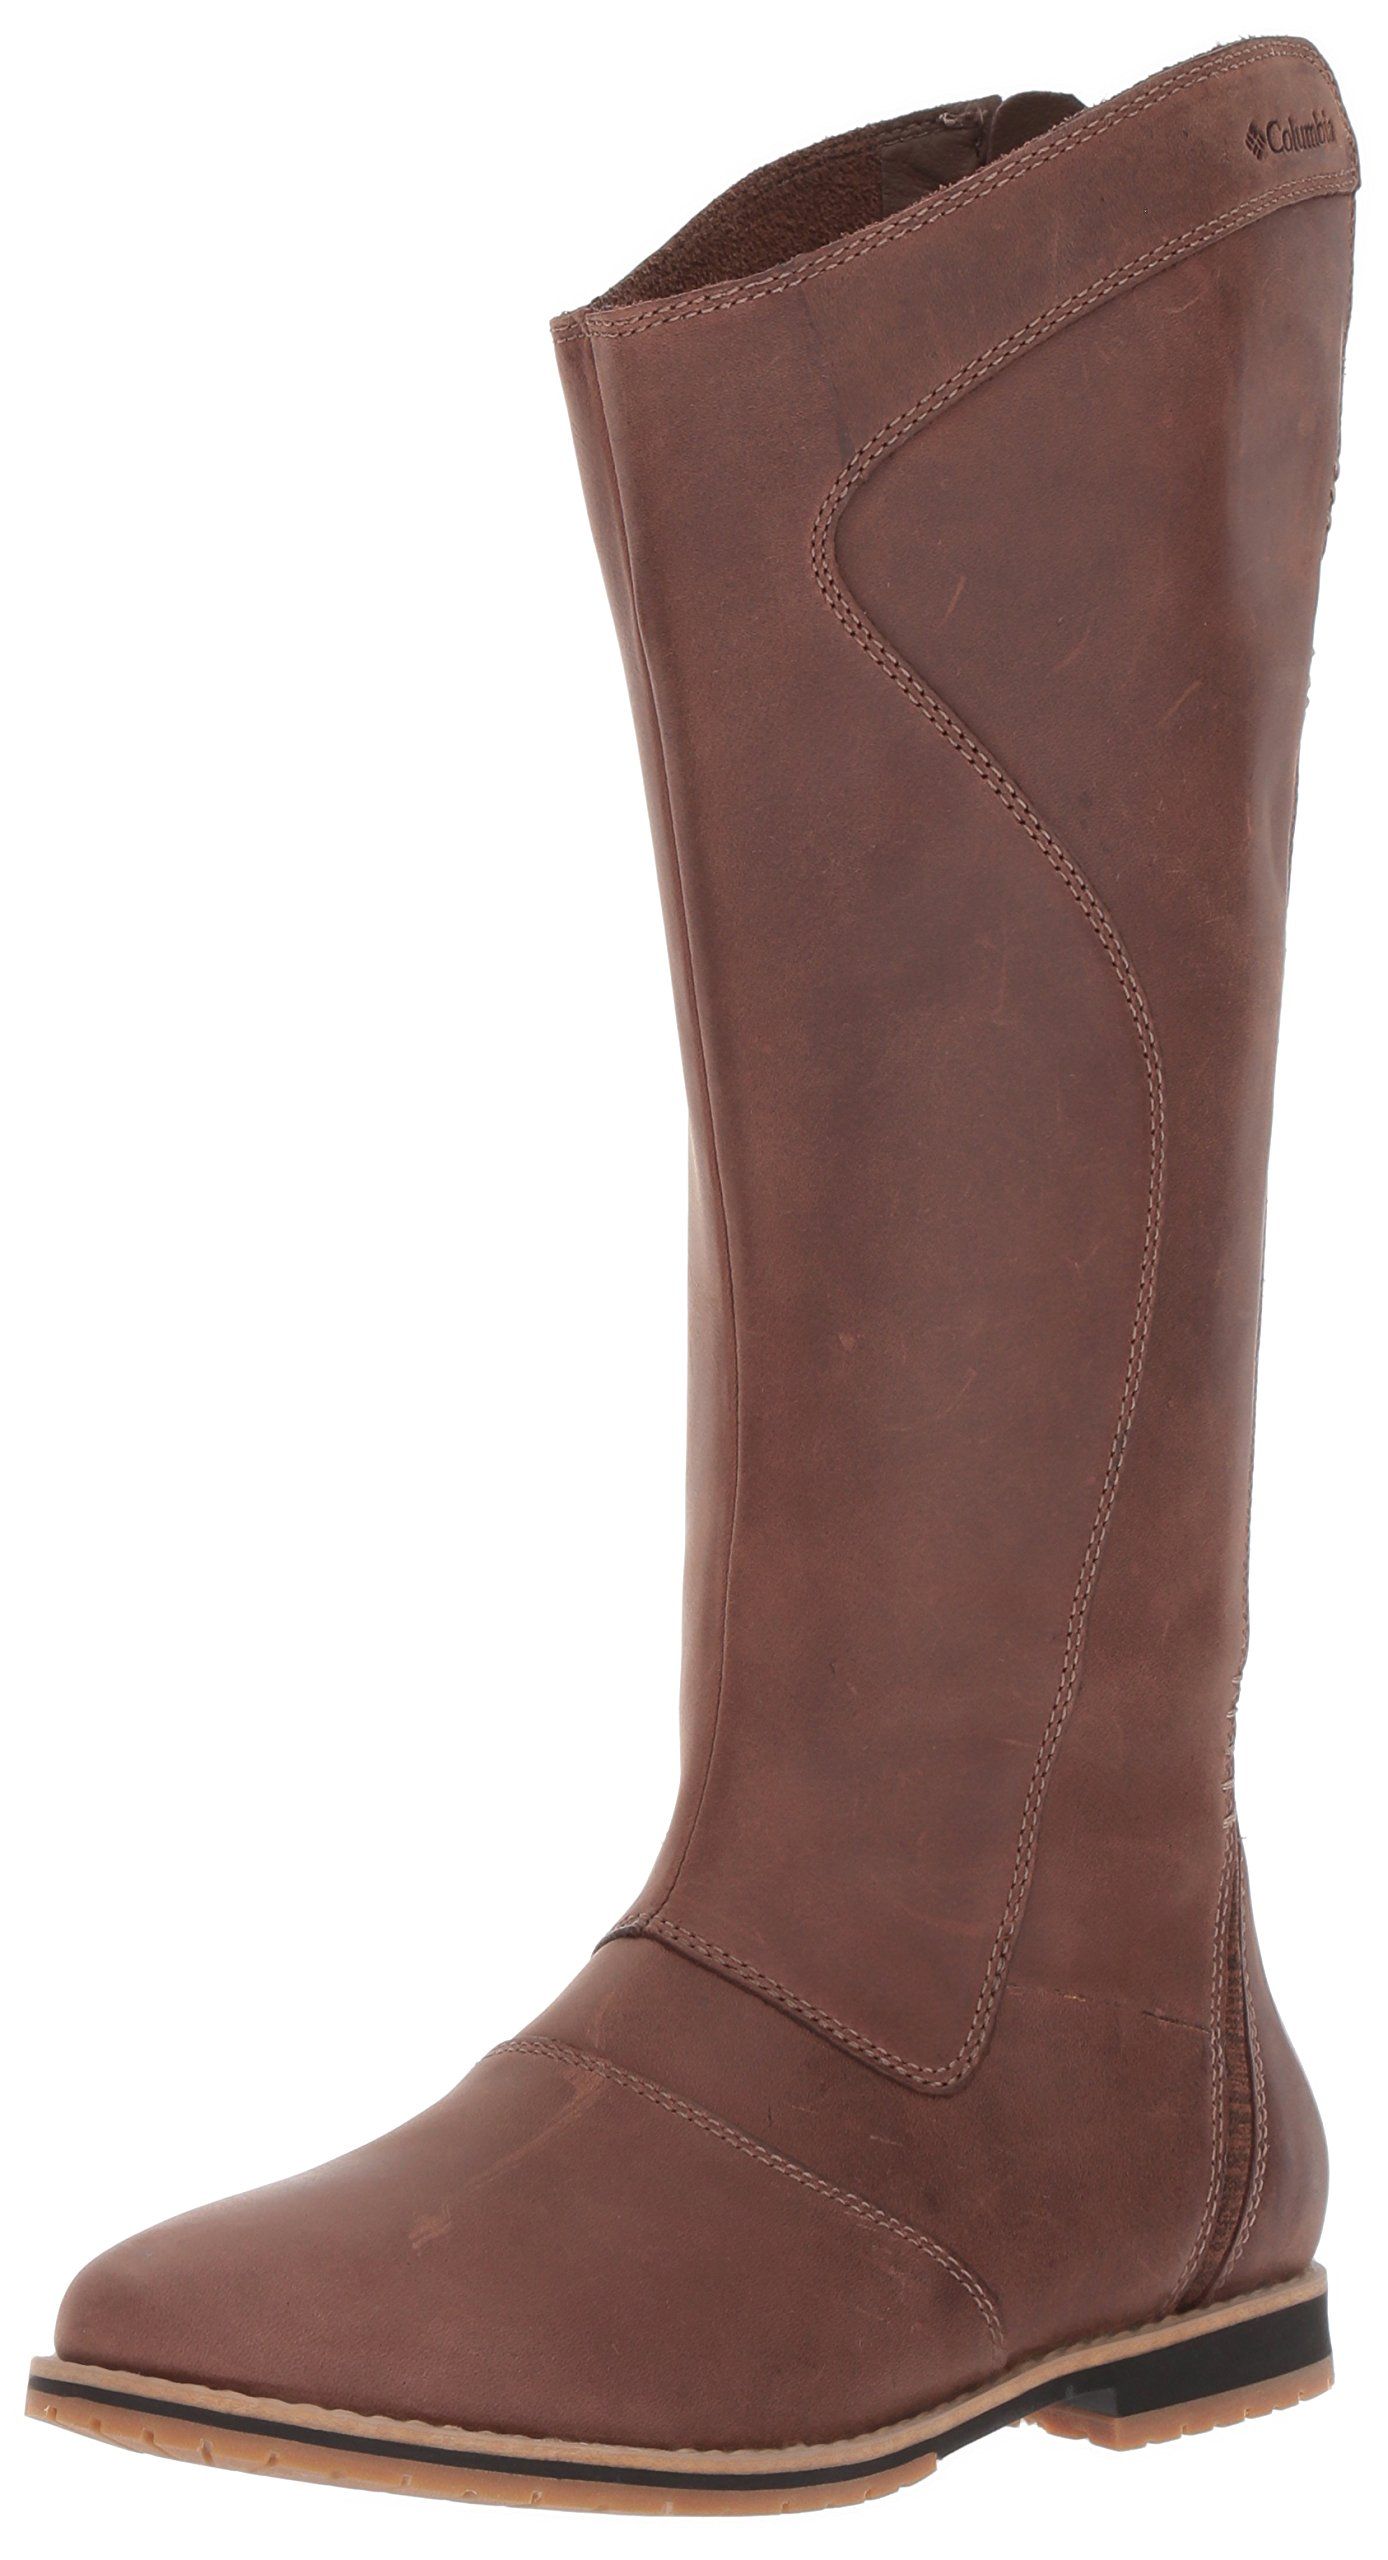 Columbia Women's Twentythird Ave Waterproof Tall Boot Uniform Dress Shoe, Tobacco, Oxford Tan, 10.5 B US